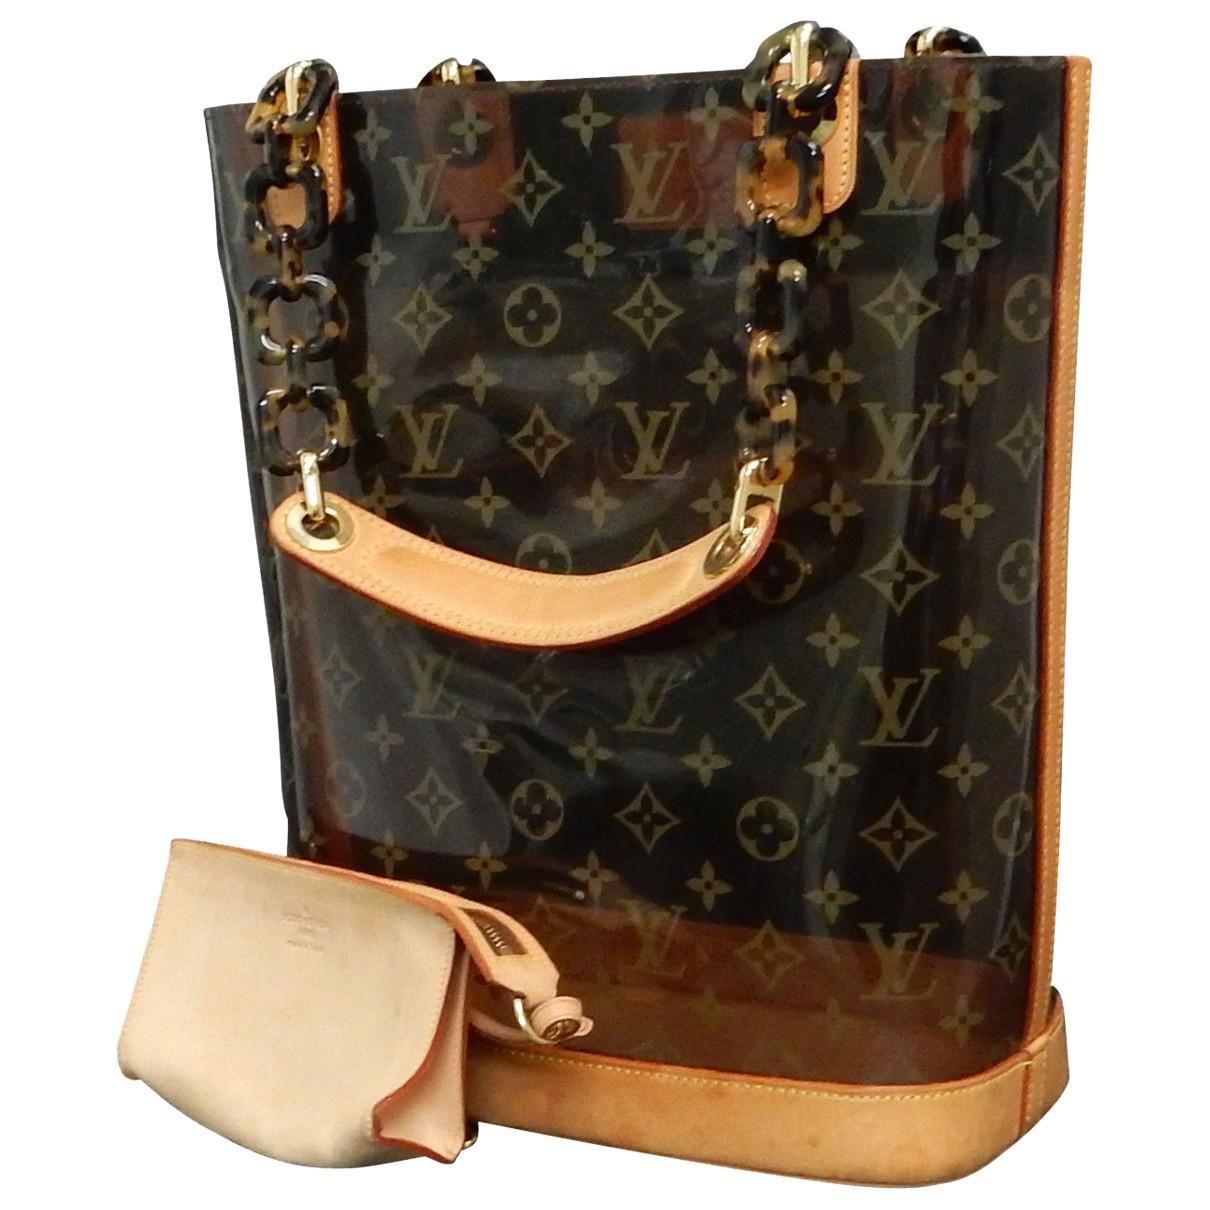 78e1c20ff059 Louis vuitton pre owned brown plastic handbag in brown lyst jpg 1210x1210 Louis  vuitton plastic purse